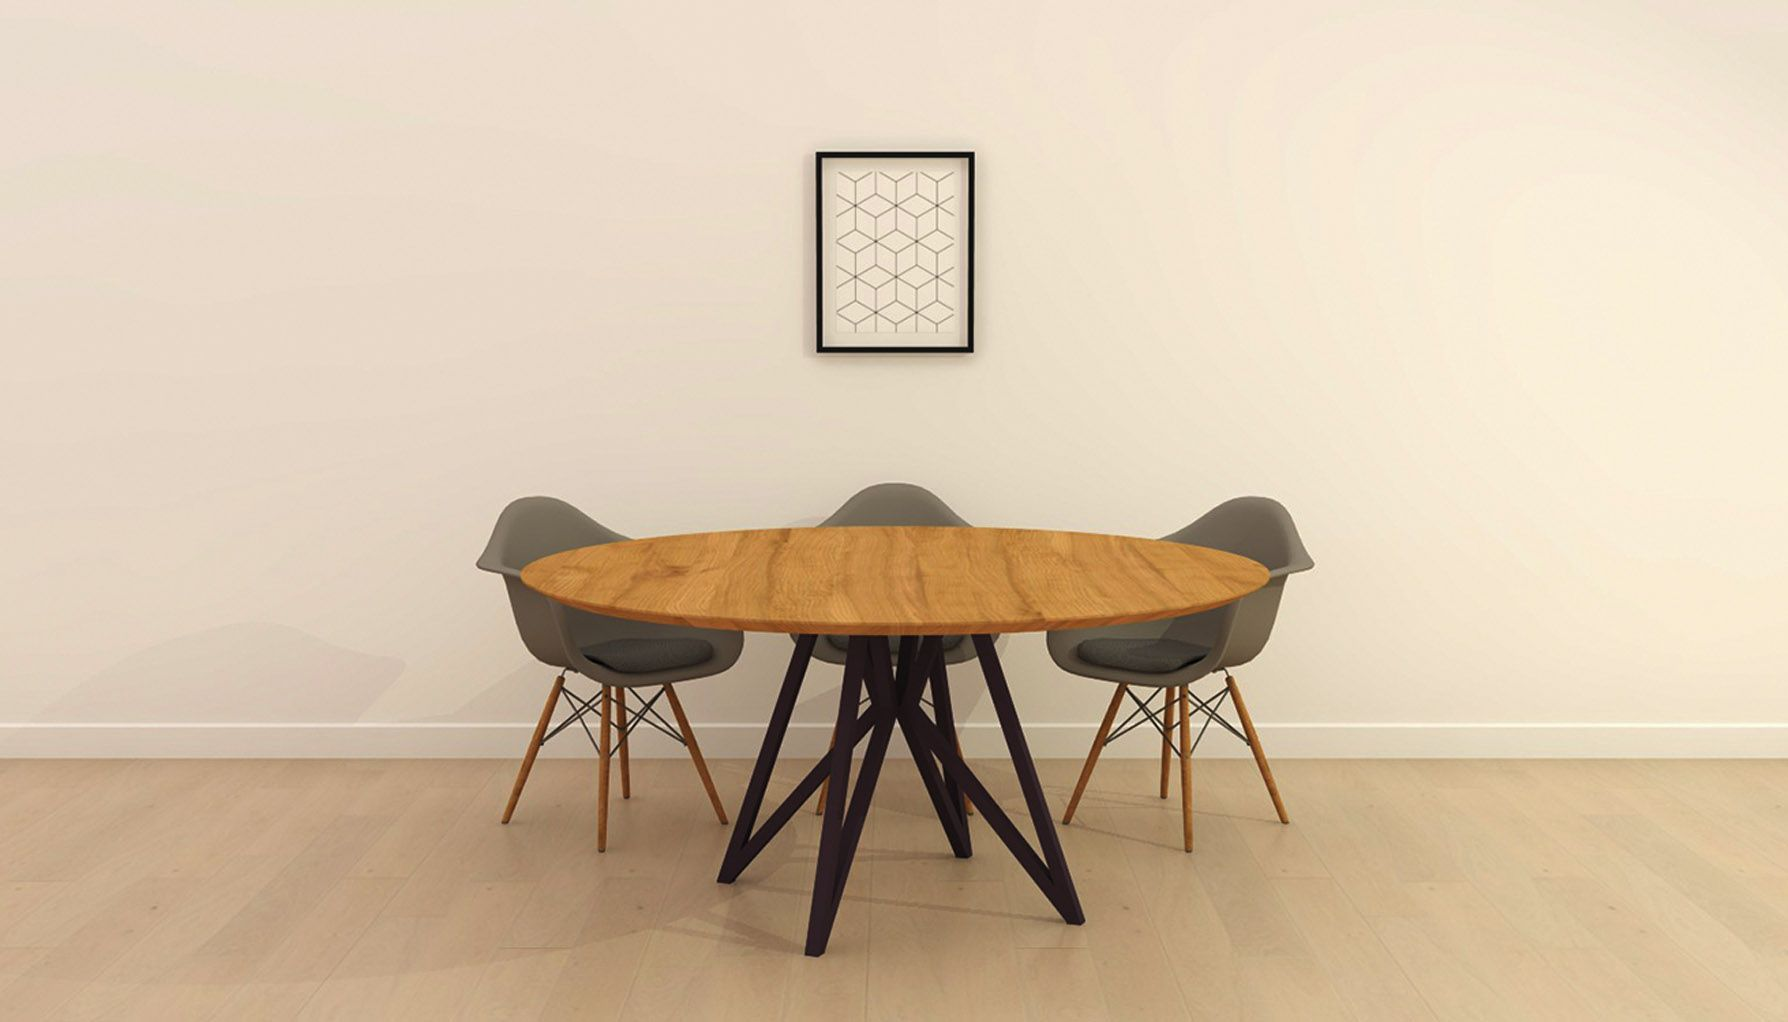 Stalen Design Tafel.Design Tafel Rond Butterfly Vlinder Quadpod Zwart Naturel Lak Studio